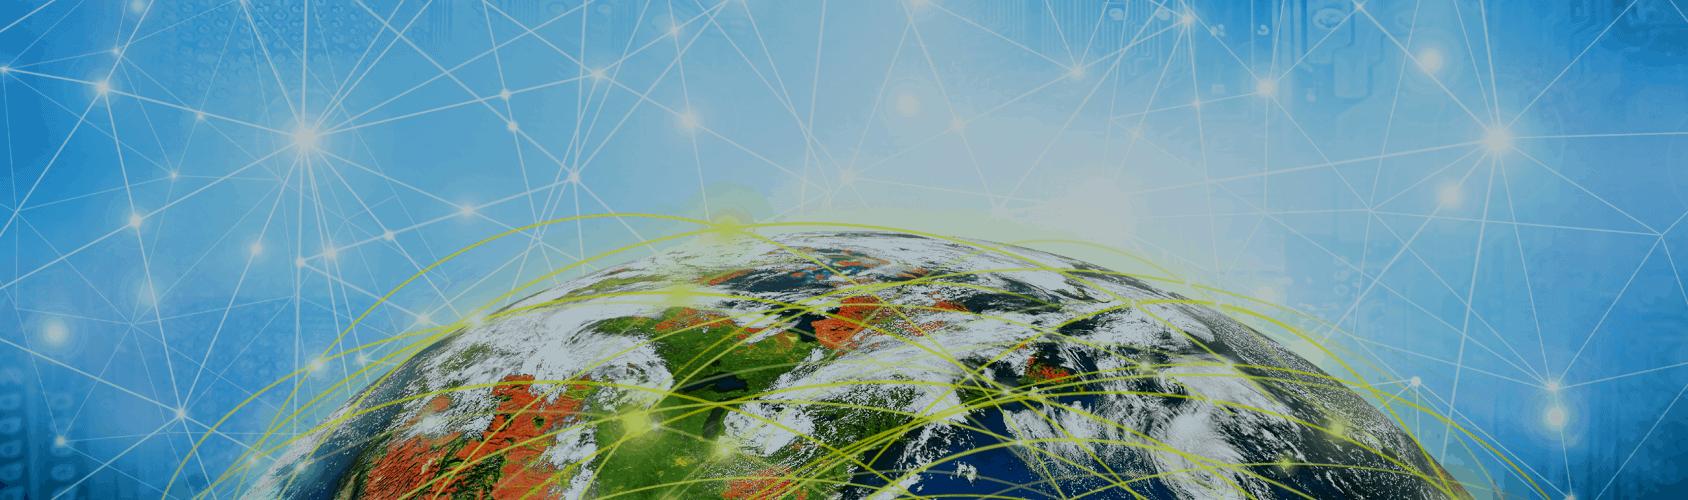 Auditing the Trade Surveillance Ecosystem